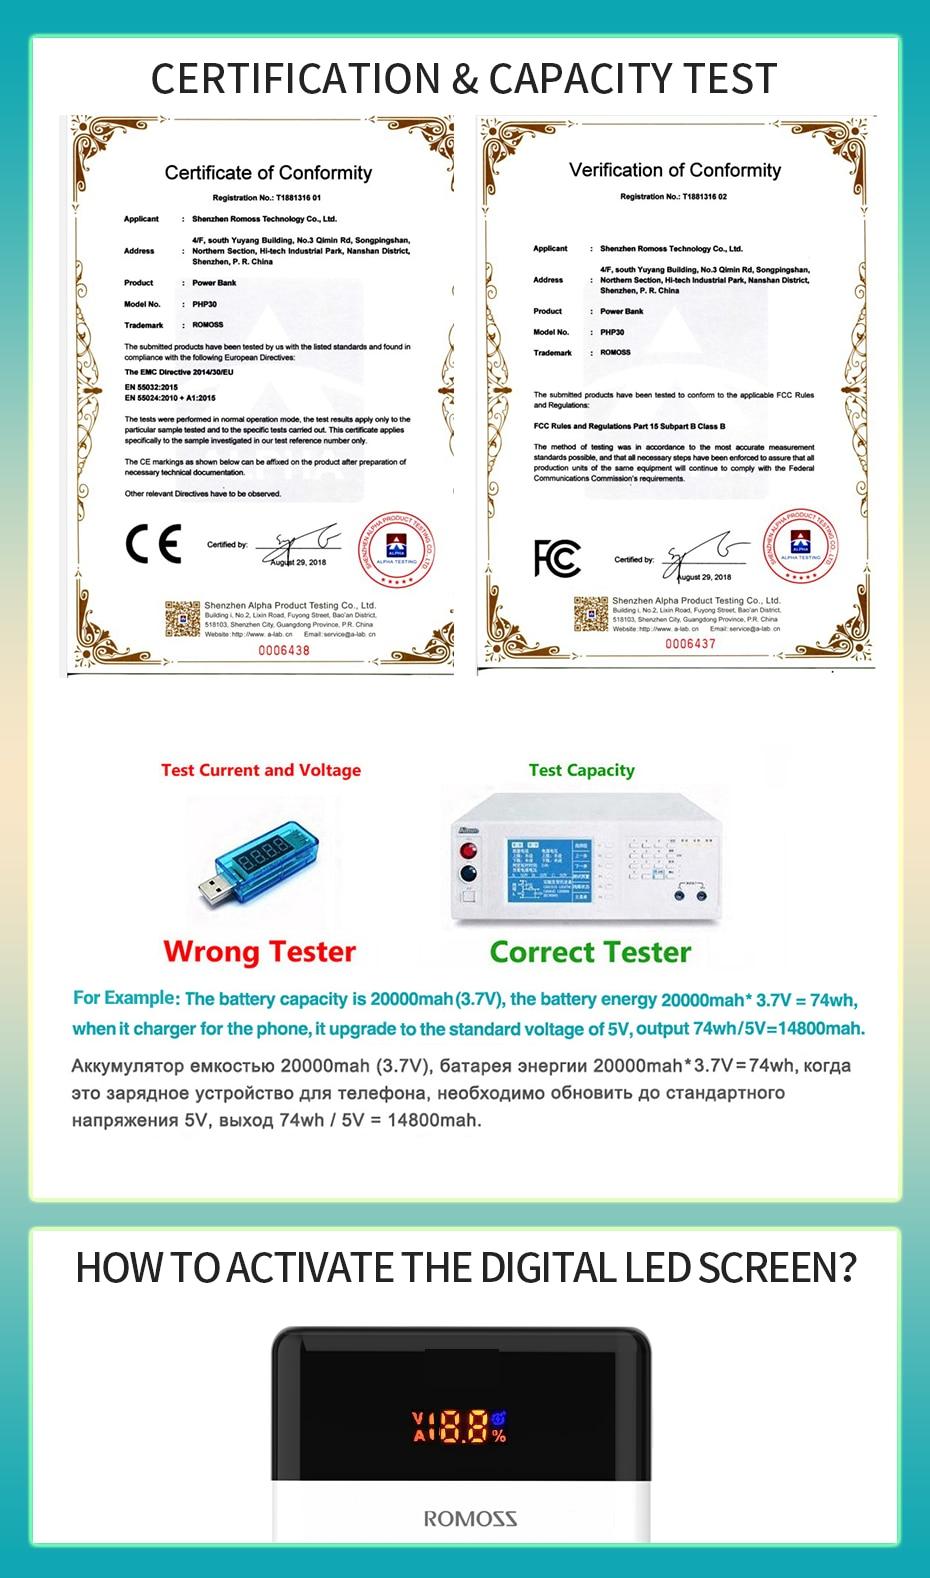 ramoss certificate